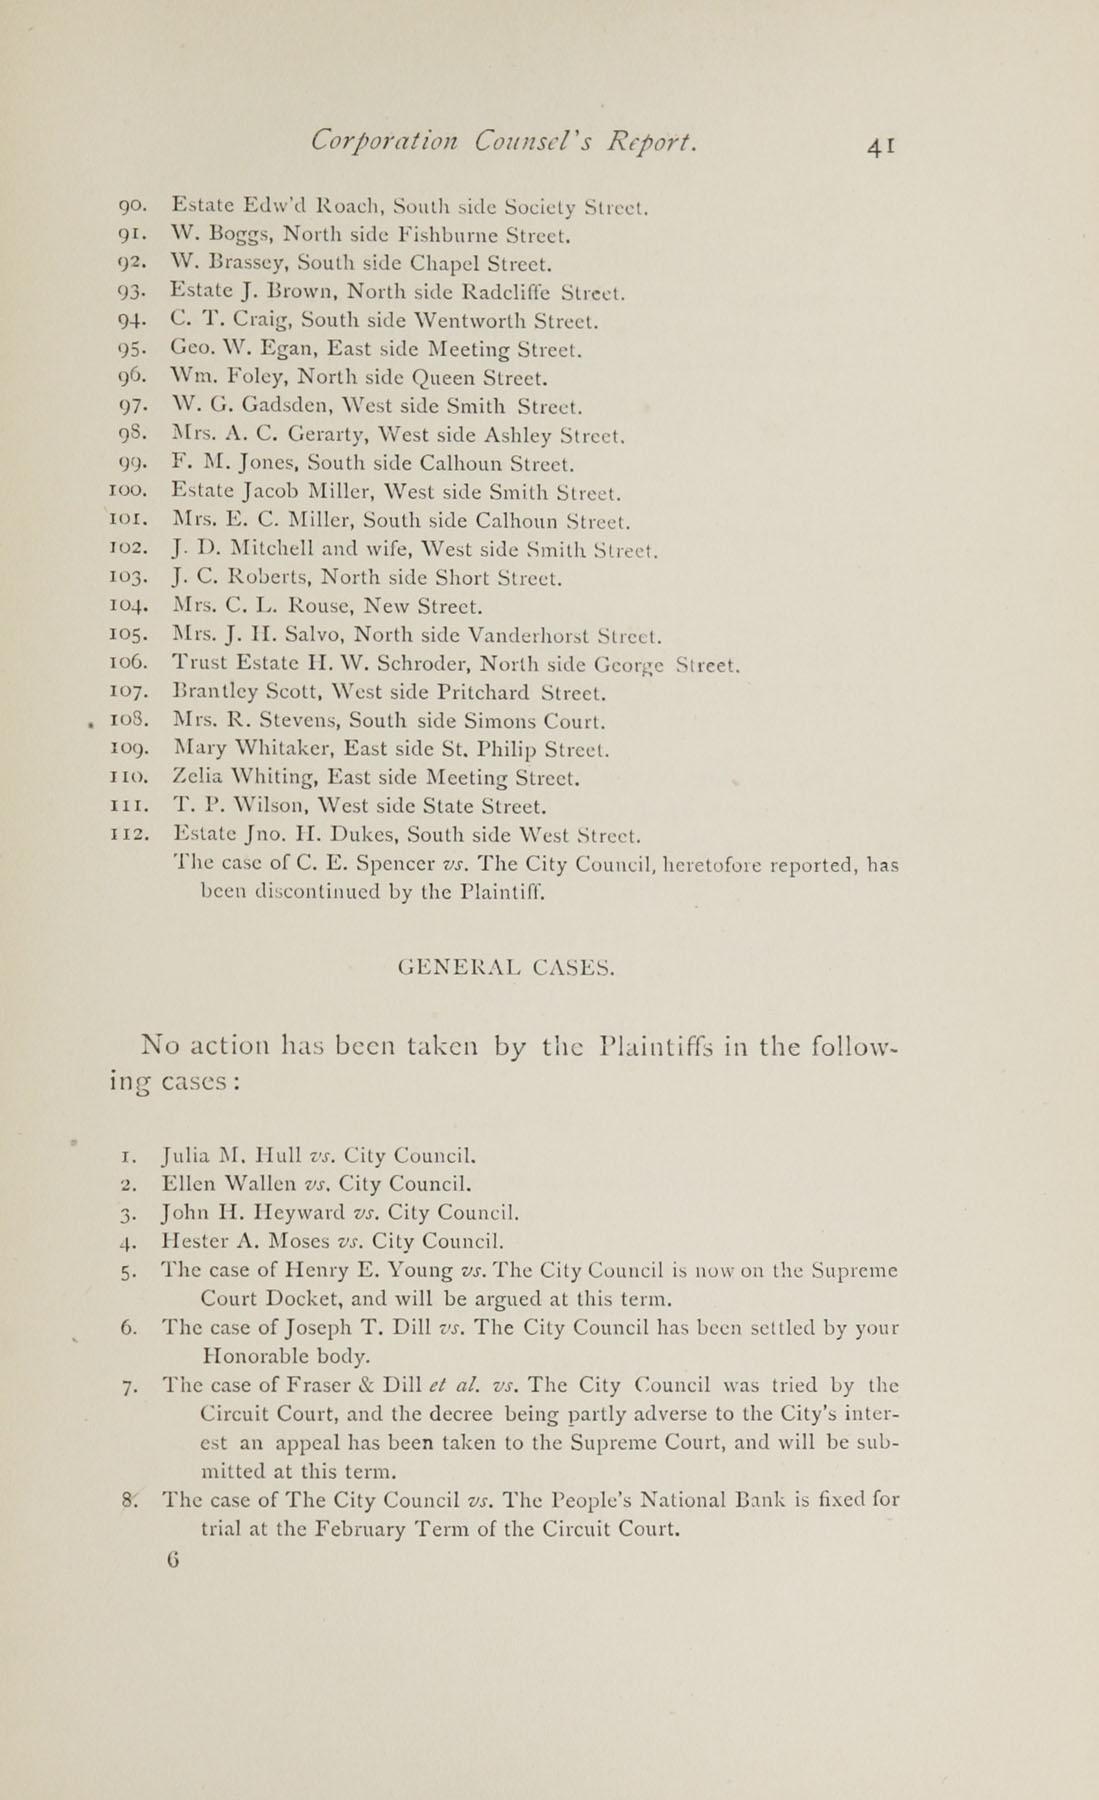 Charleston Yearbook, 1882, page 41